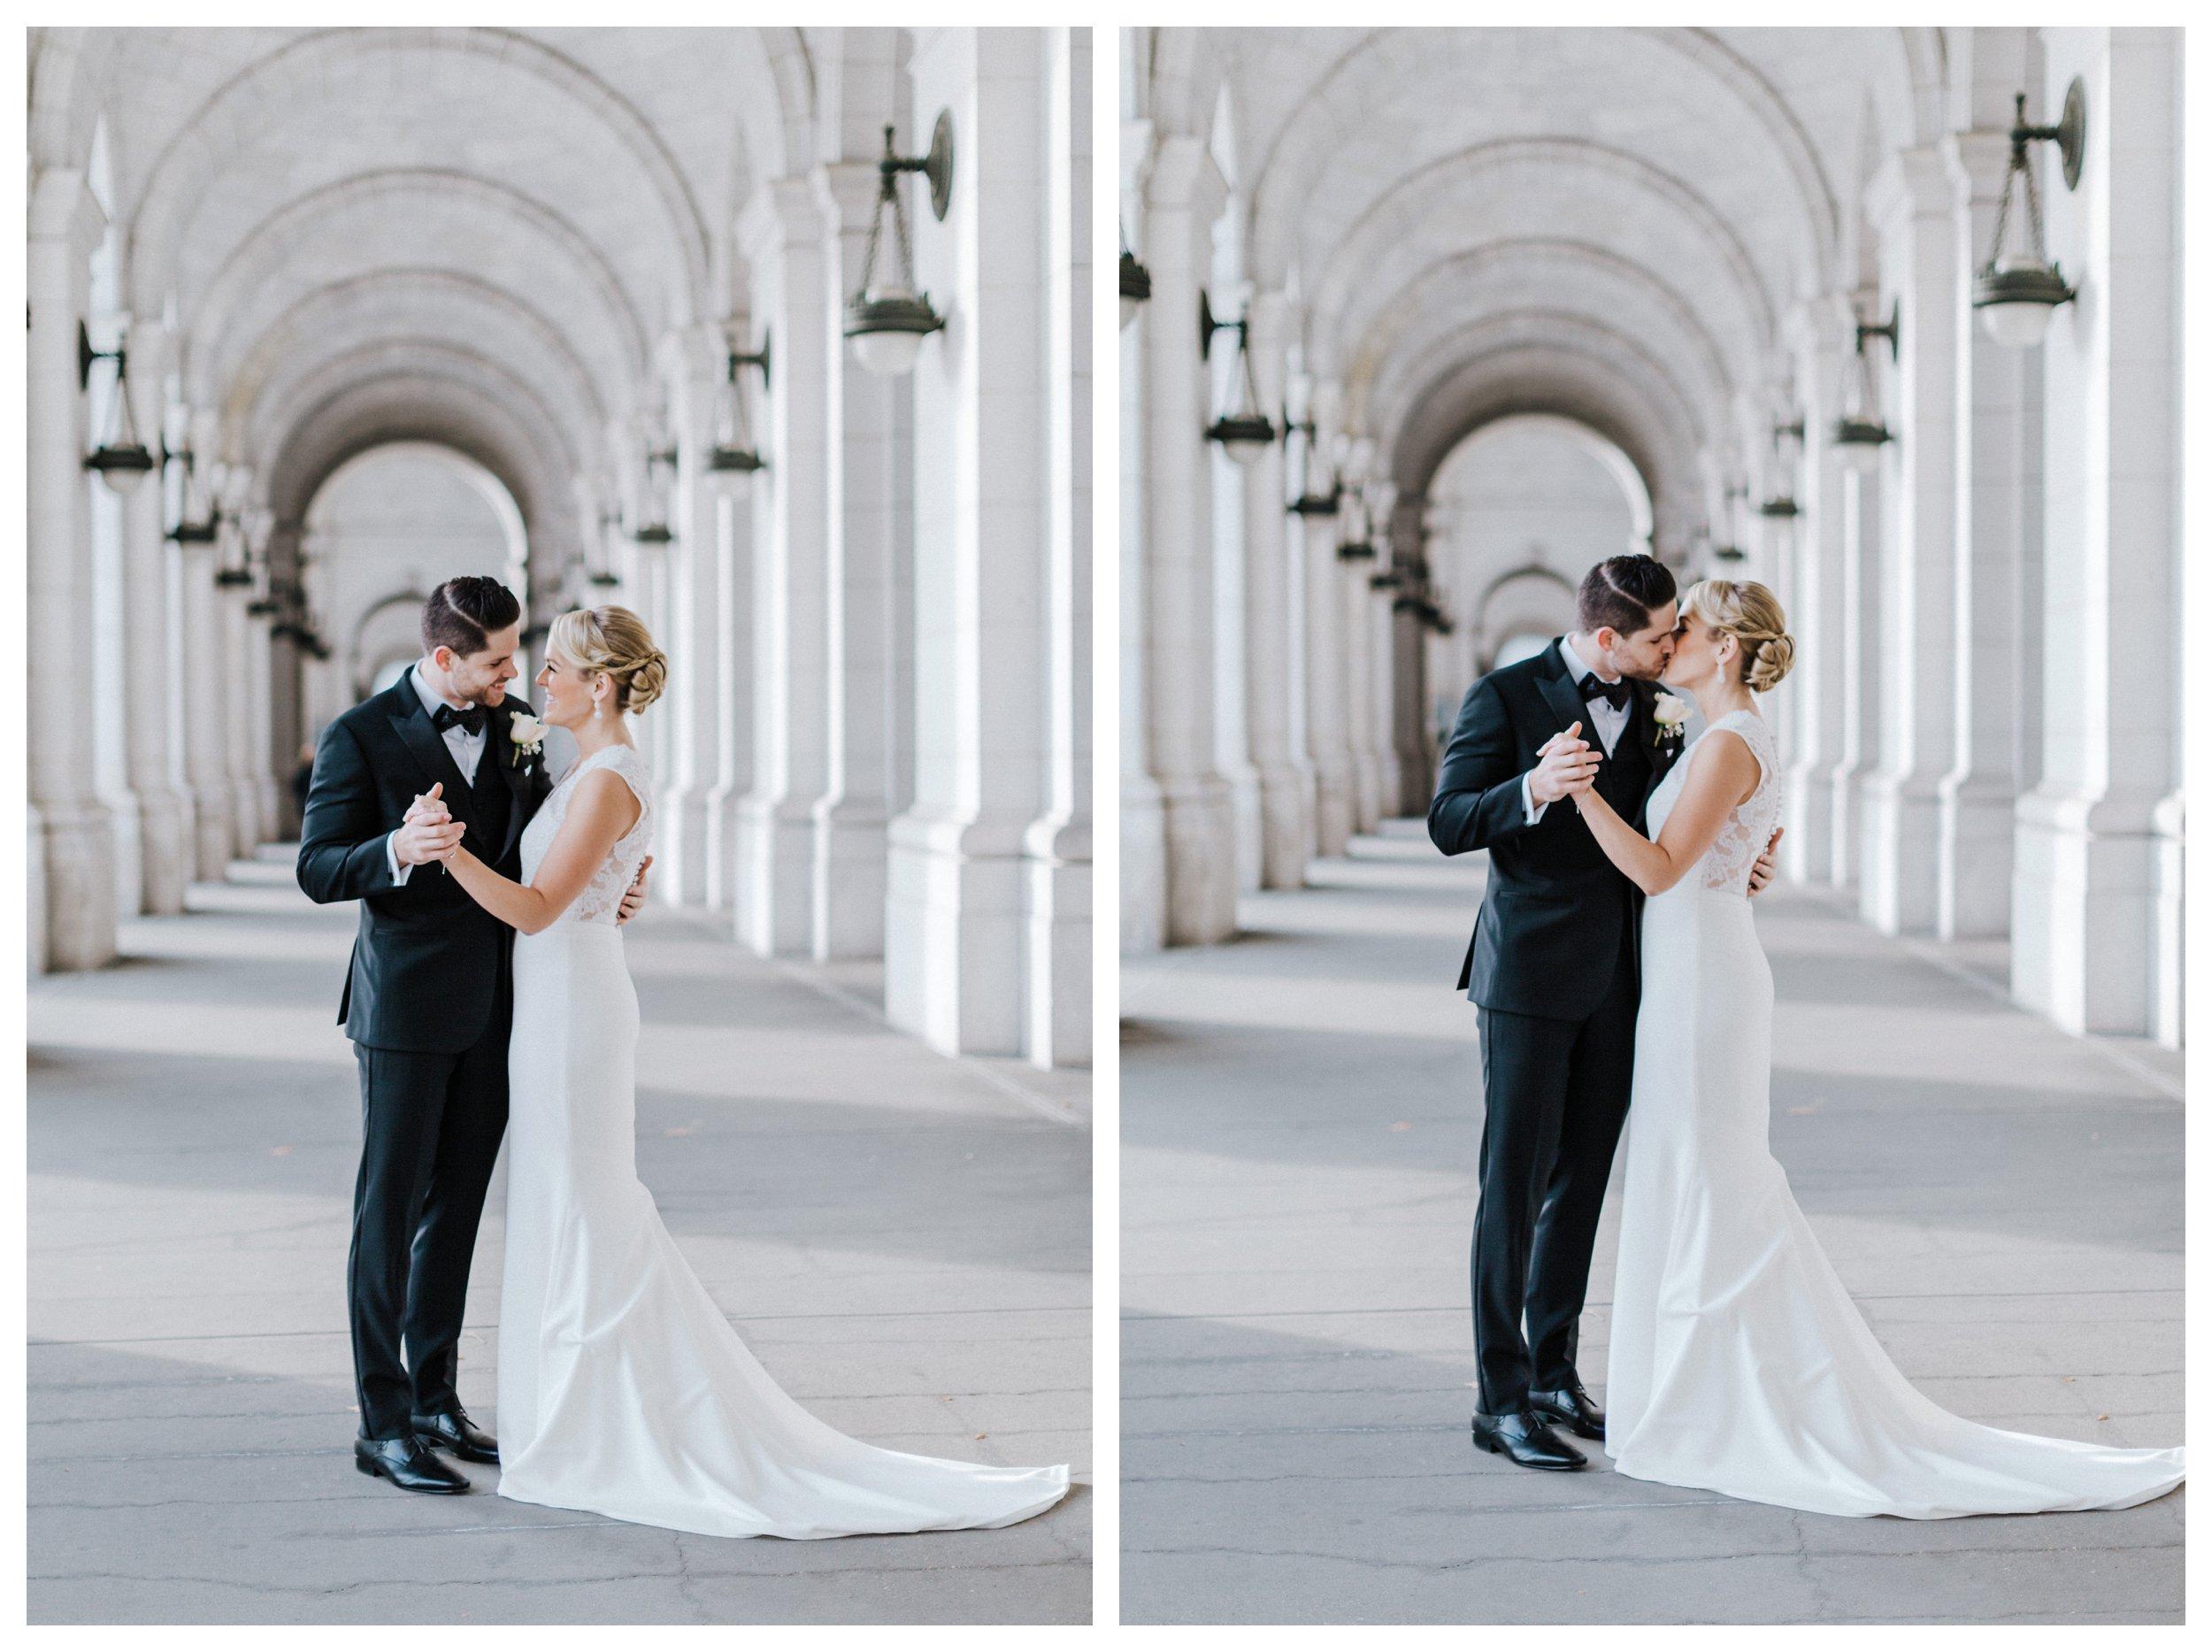 washington-dc-wedding-photographer-15.JPG